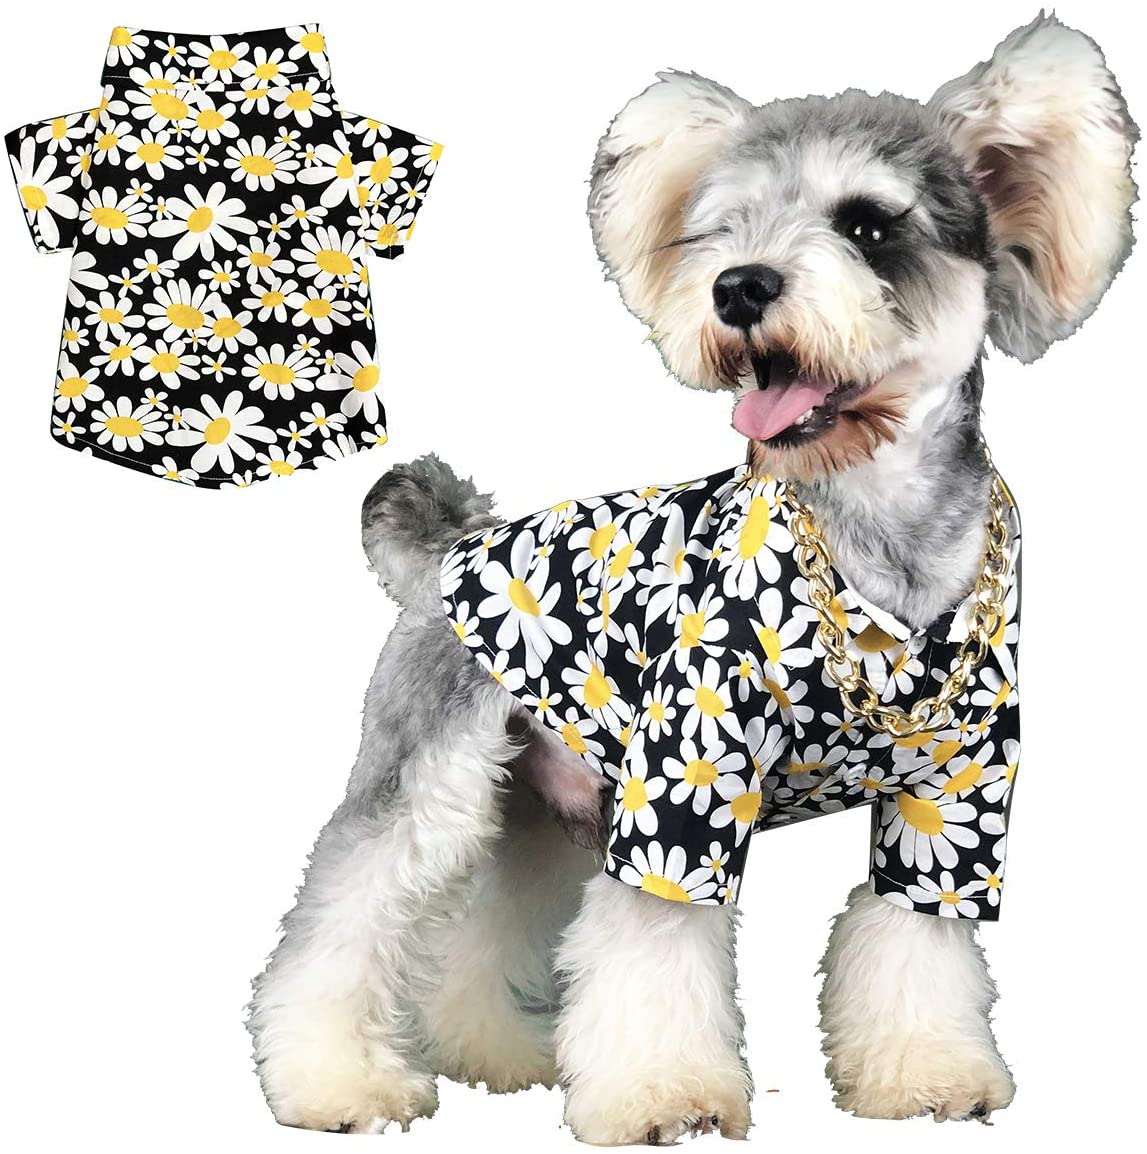 Yolispa Dog Shirt Pet Summer Floral Clothes Apparel Cotton for Small Puppy Medium Dog